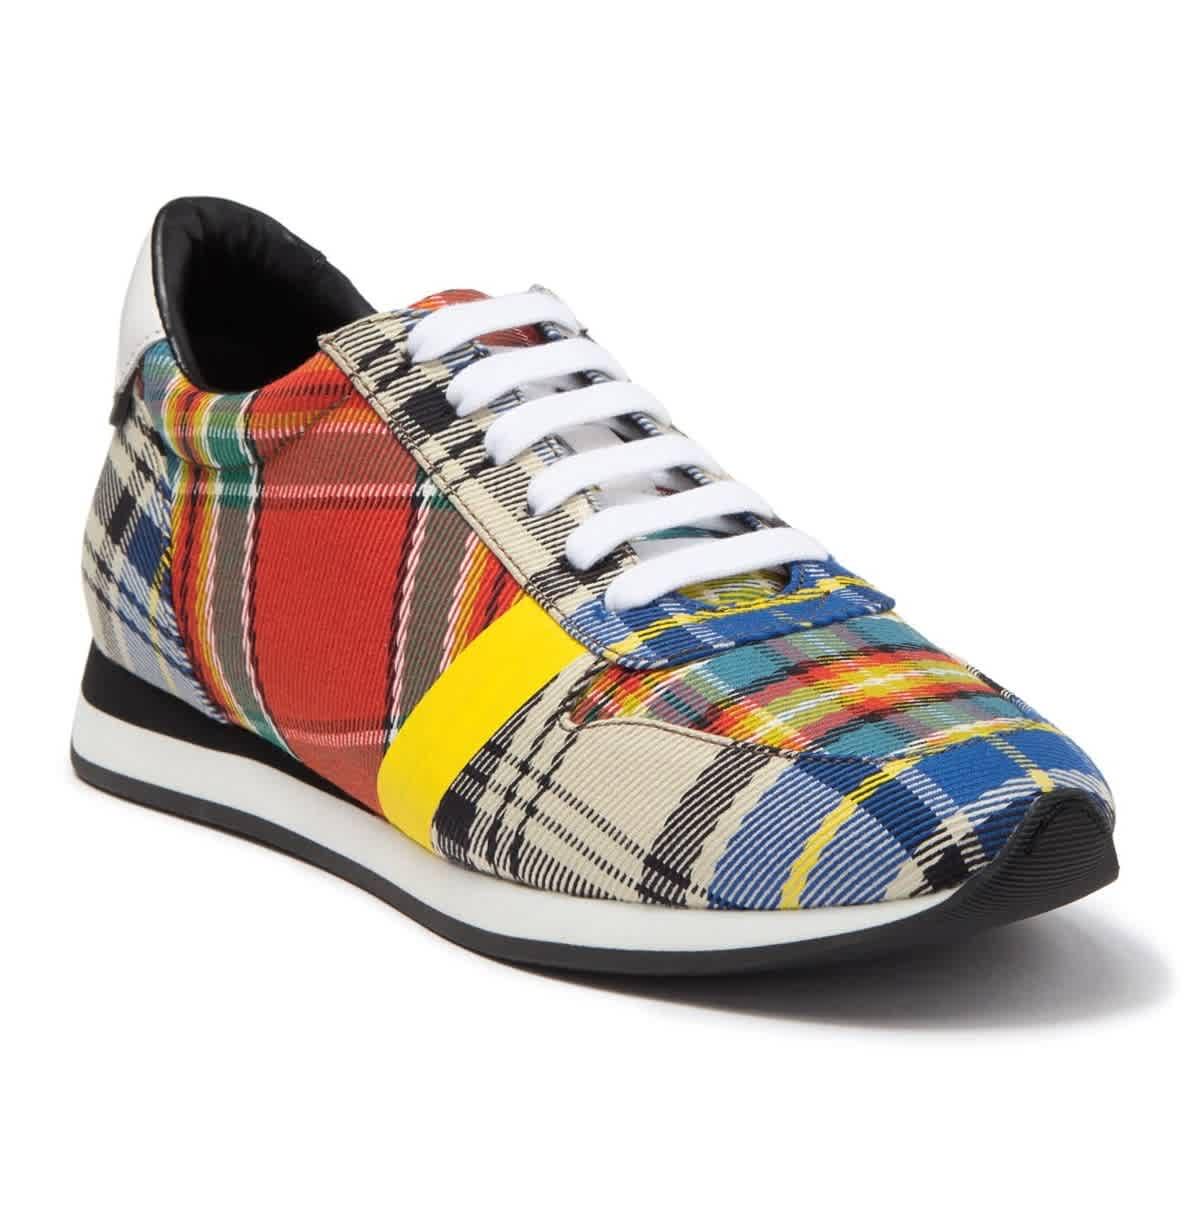 Burberry Amelia Chalk Mixed Tartan Sneaker In N,a